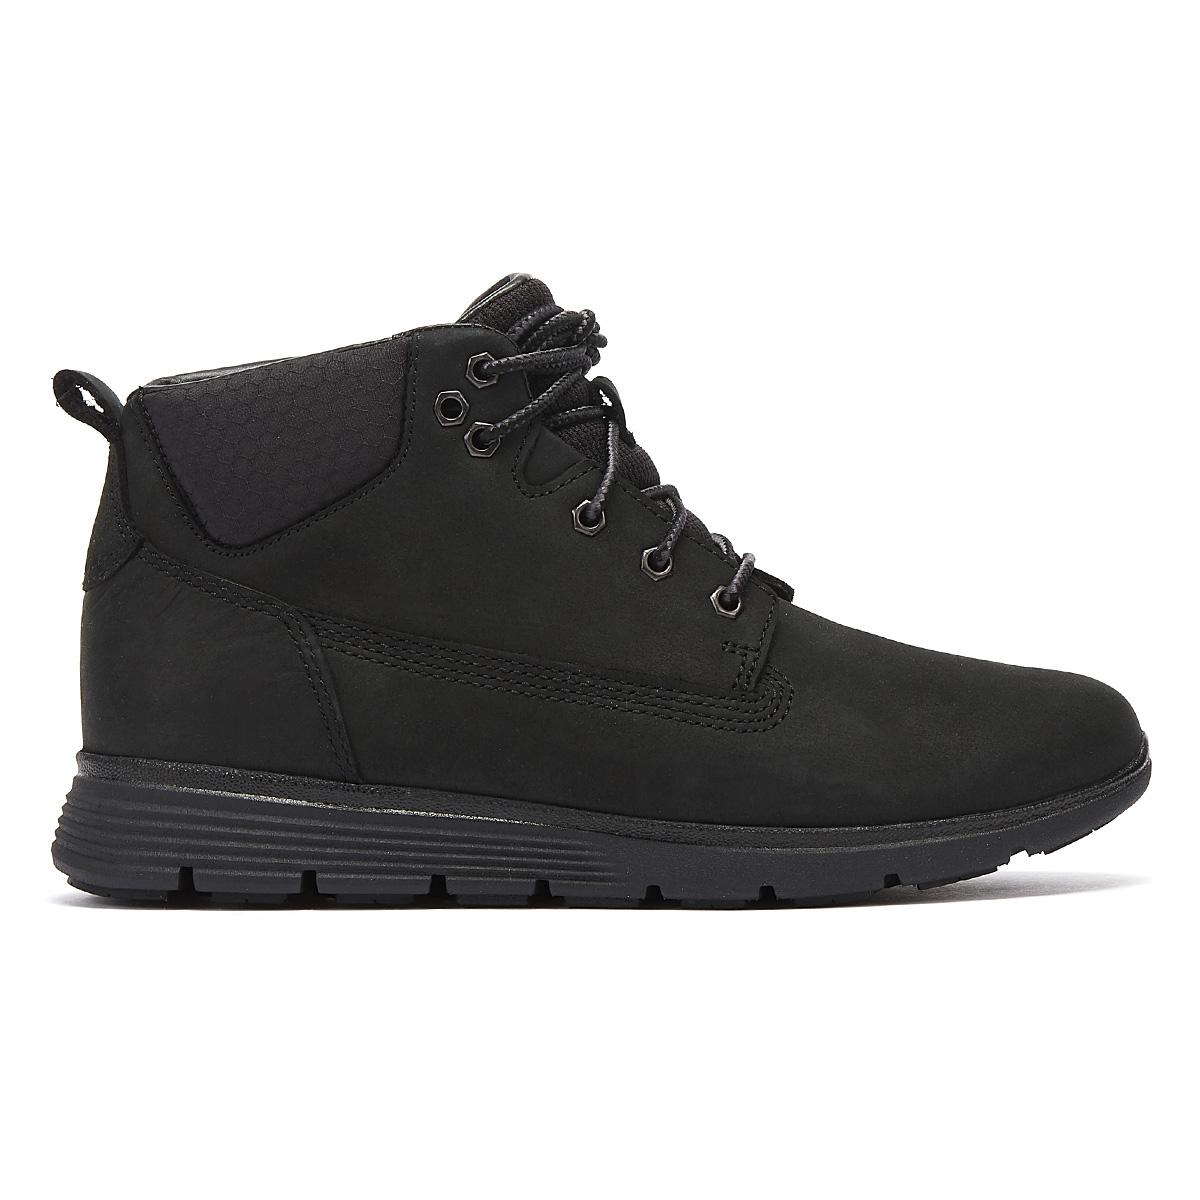 Details about Timberland Killington Junior Black Chukka Boots Kids Leather Winter Shoes